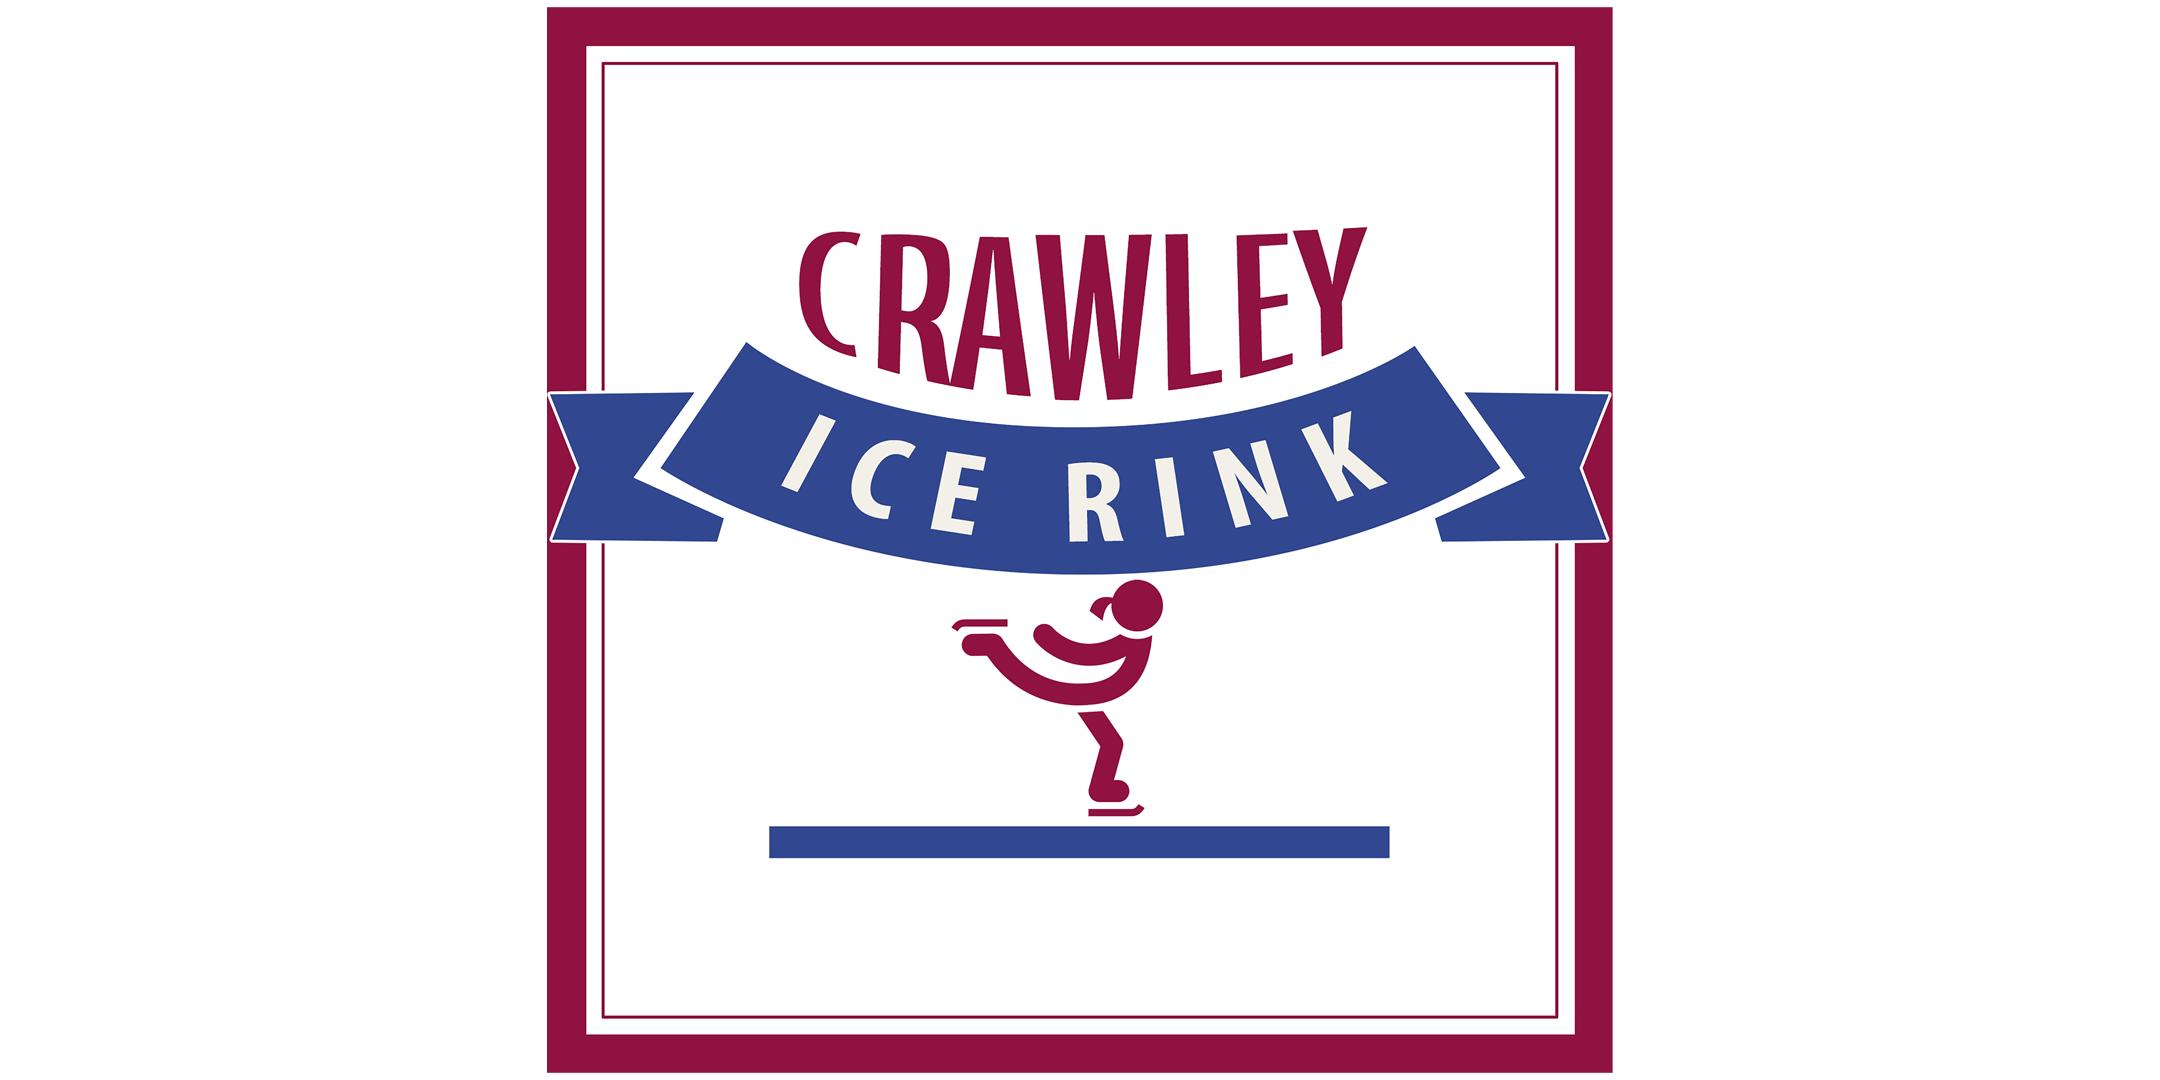 Crawley Ice Rink - 9th December (Off Peak)